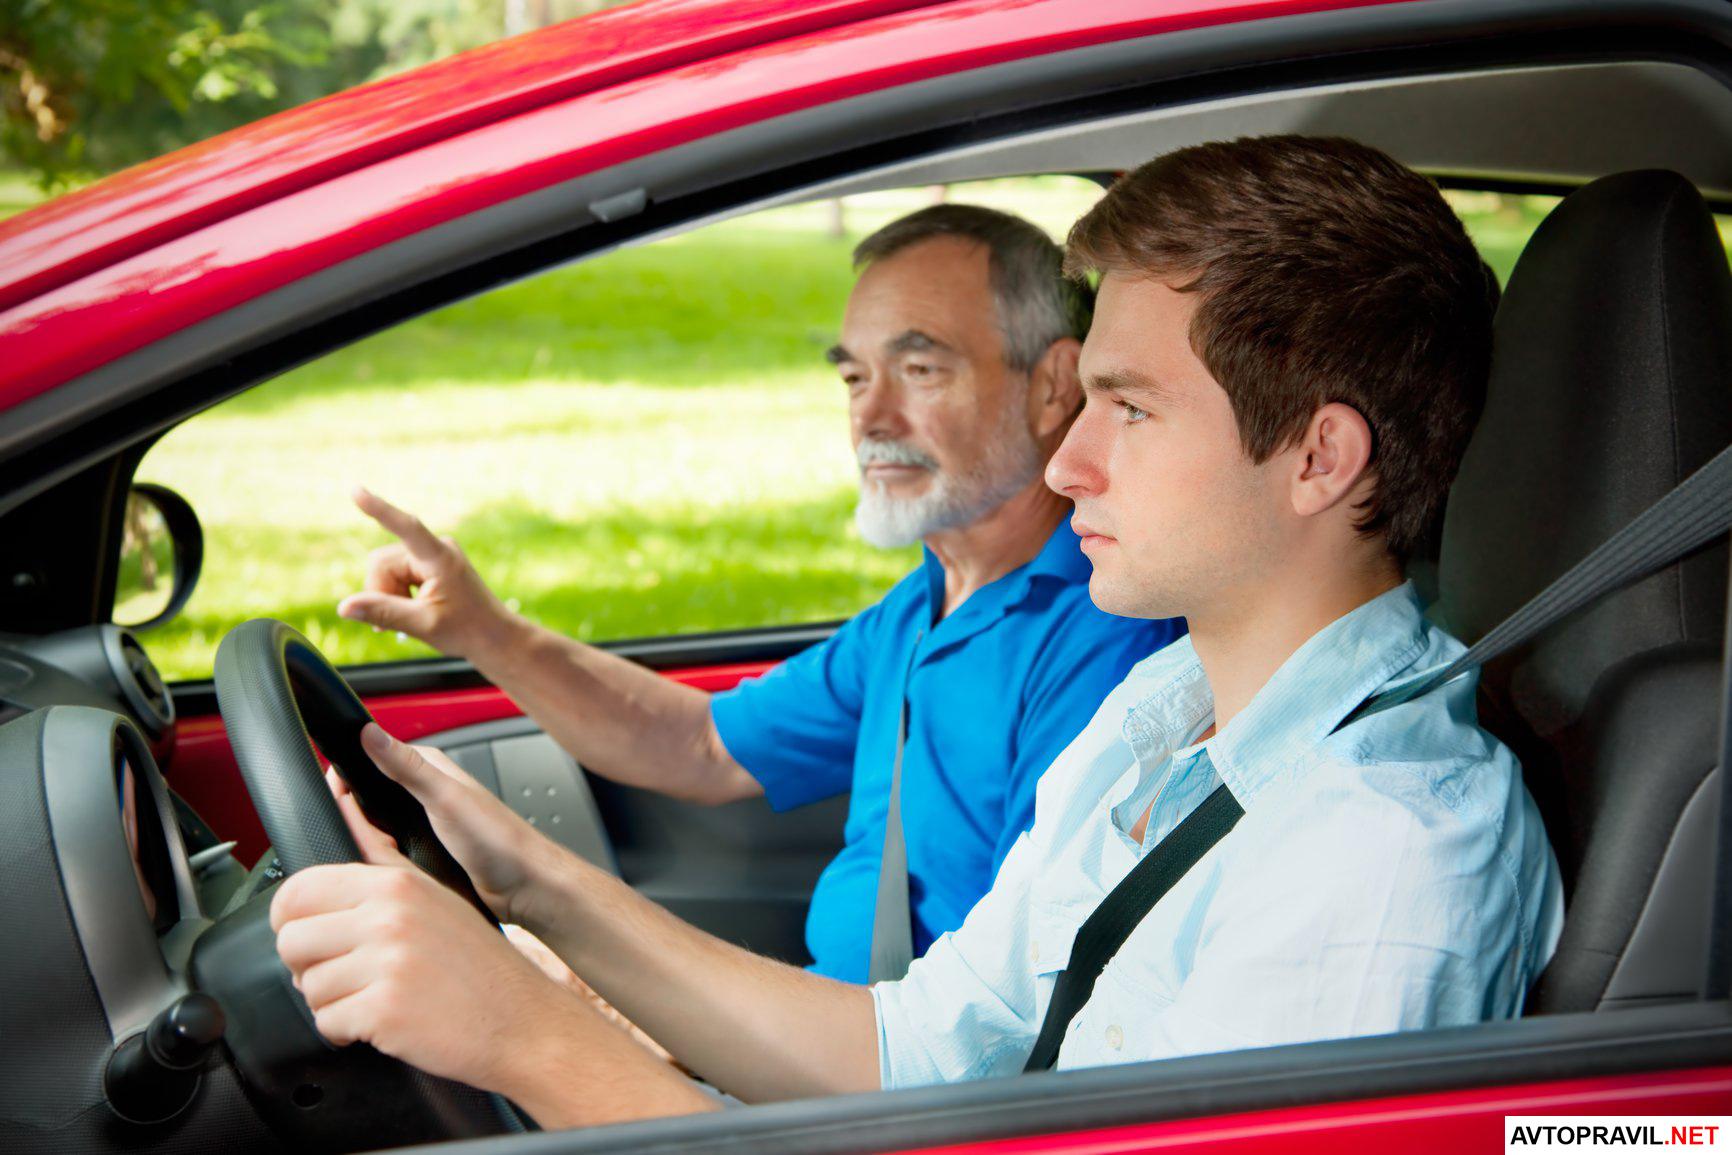 подросток за рулем автомобиля с иснтруктором